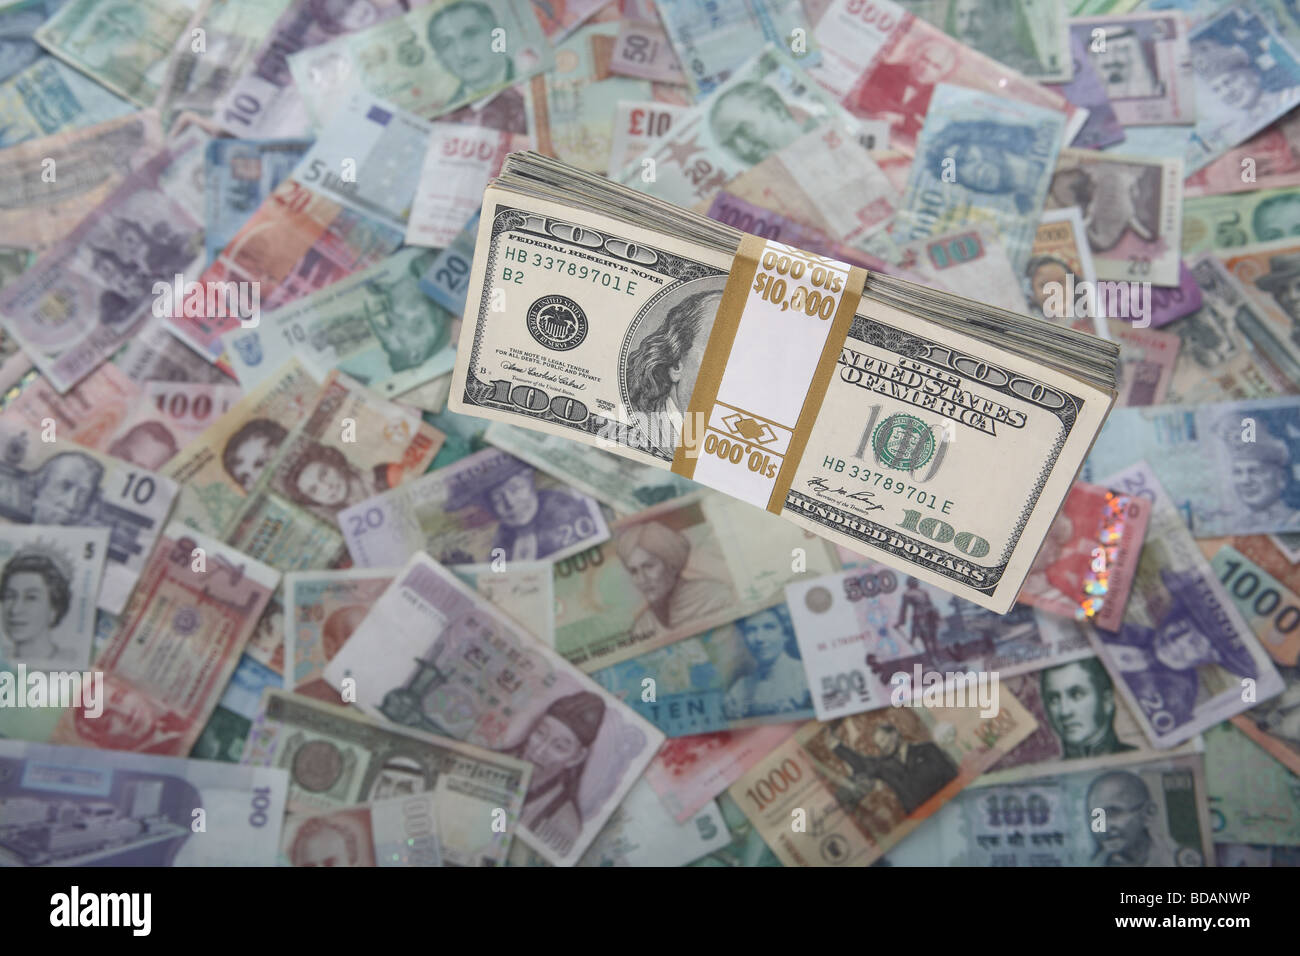 A bundled stack of hundred dollar bills on a soft background of international currencies - Stock Image